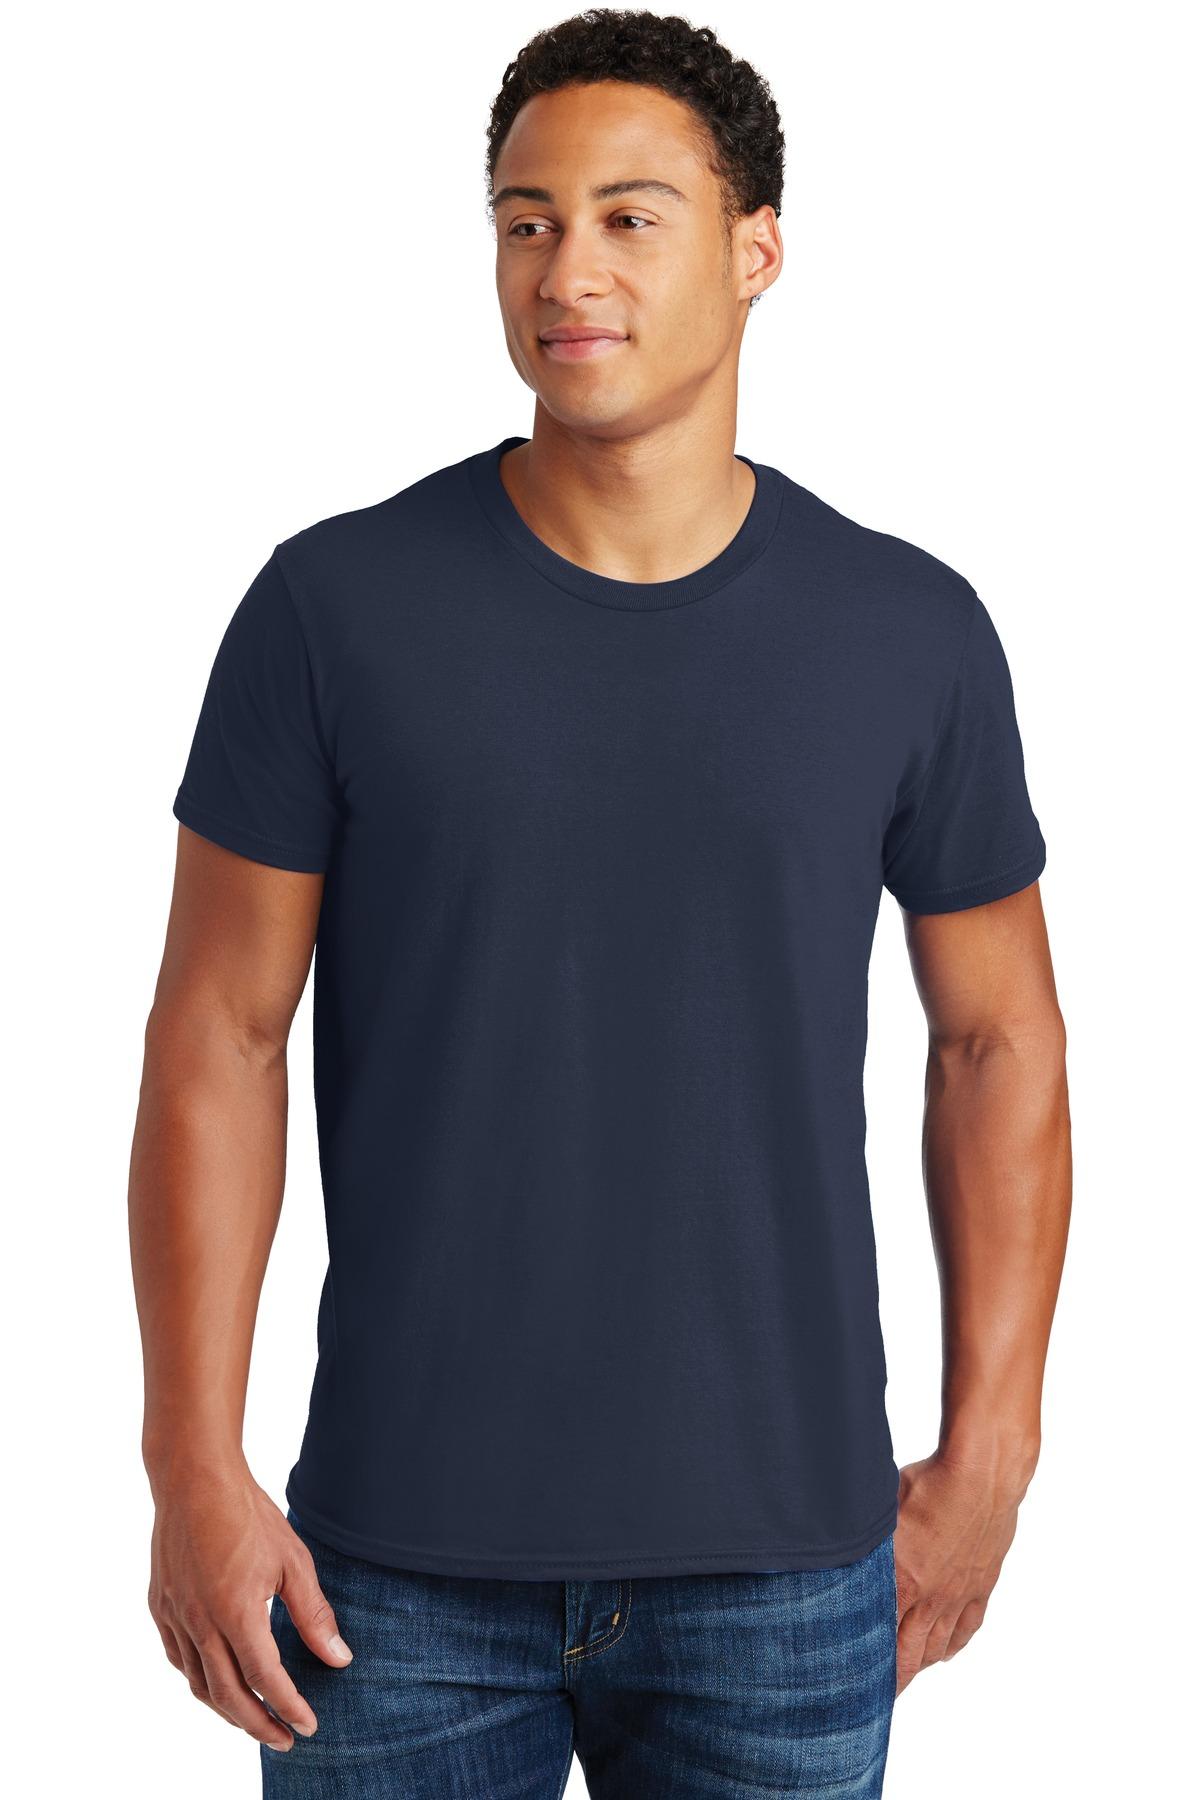 Hanes  - Nano-T  Cotton T-Shirt. 4980